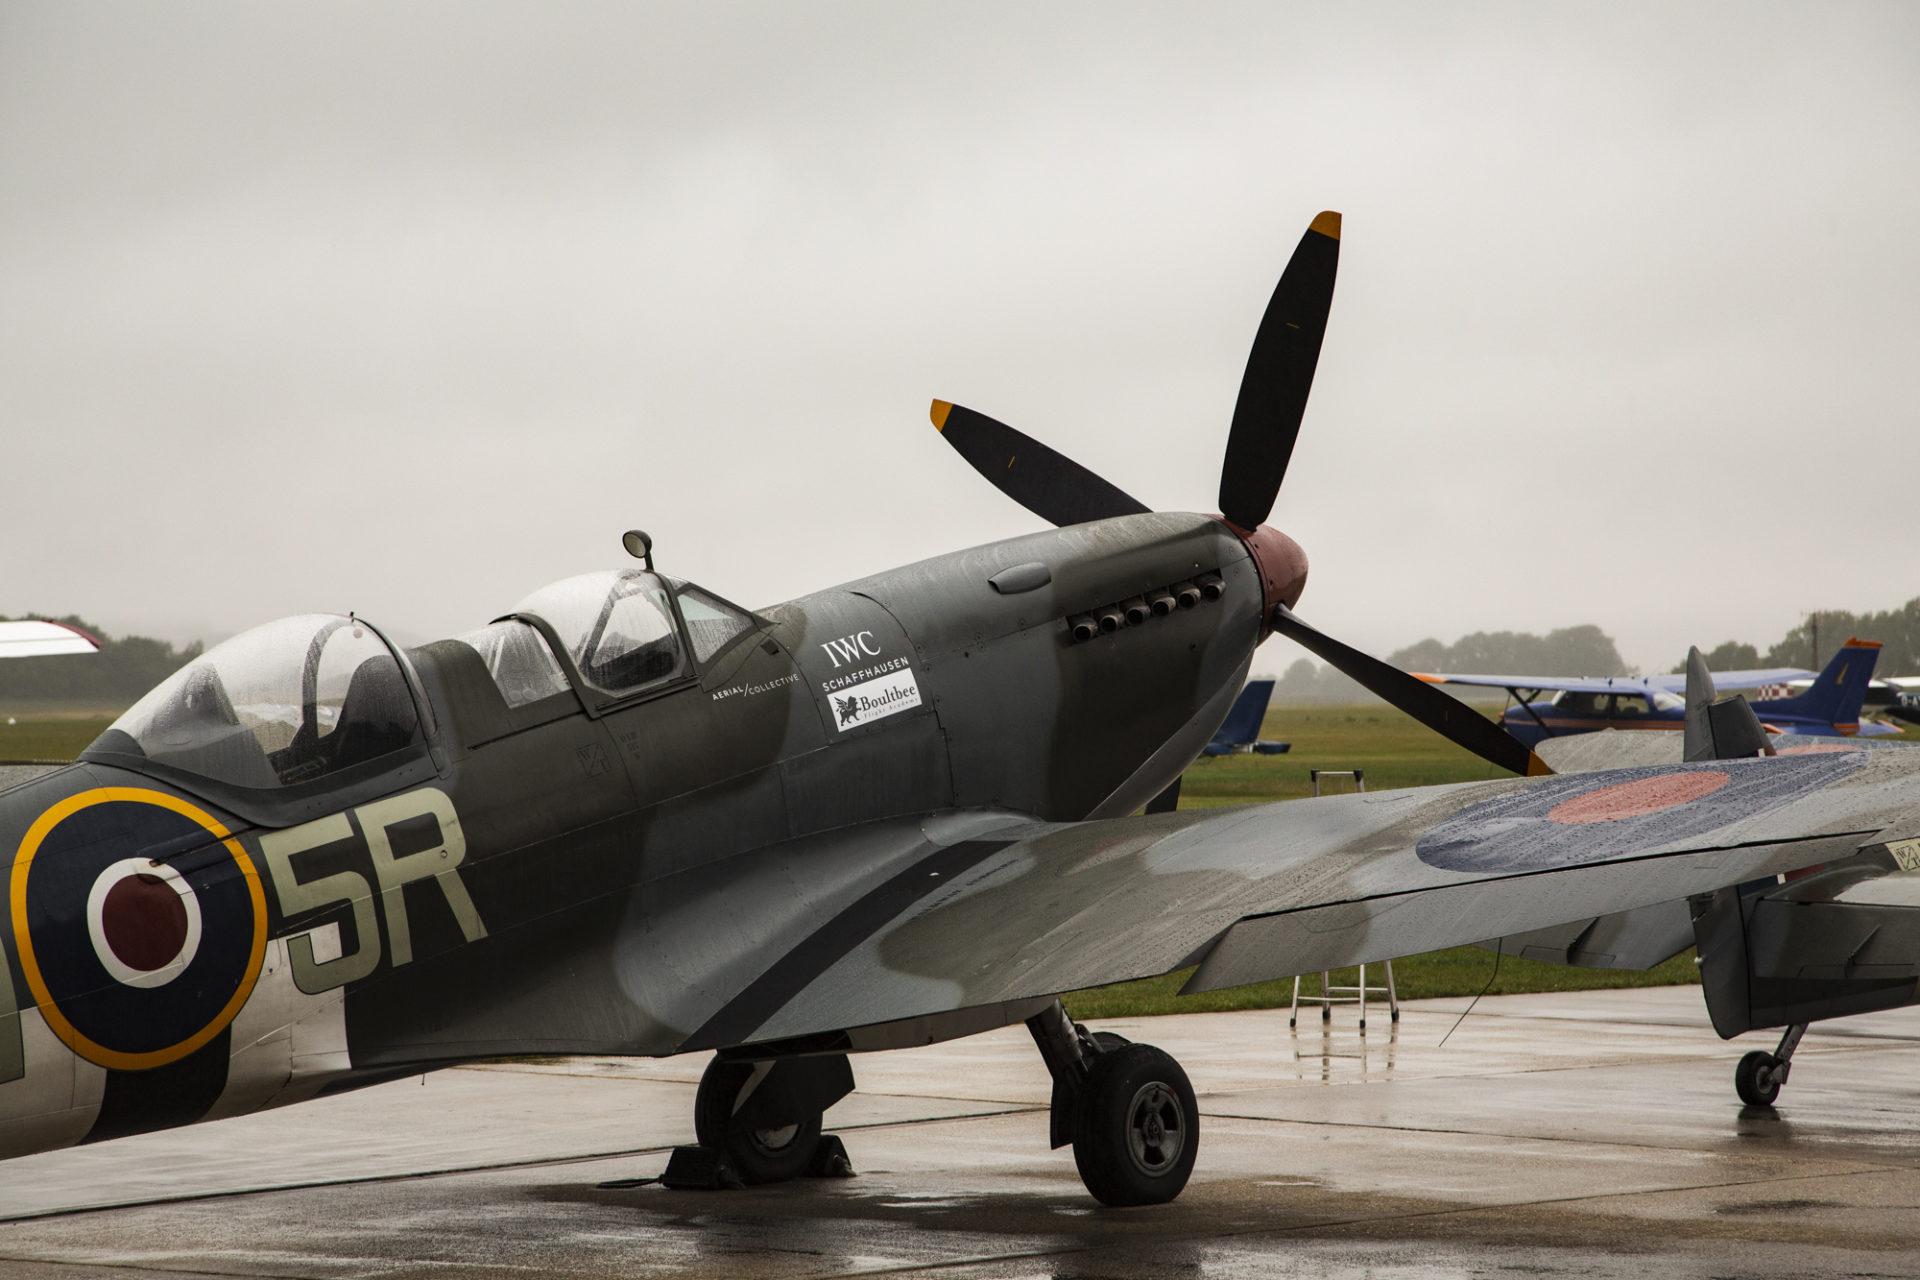 IWC The Longest Flight - Spitfire